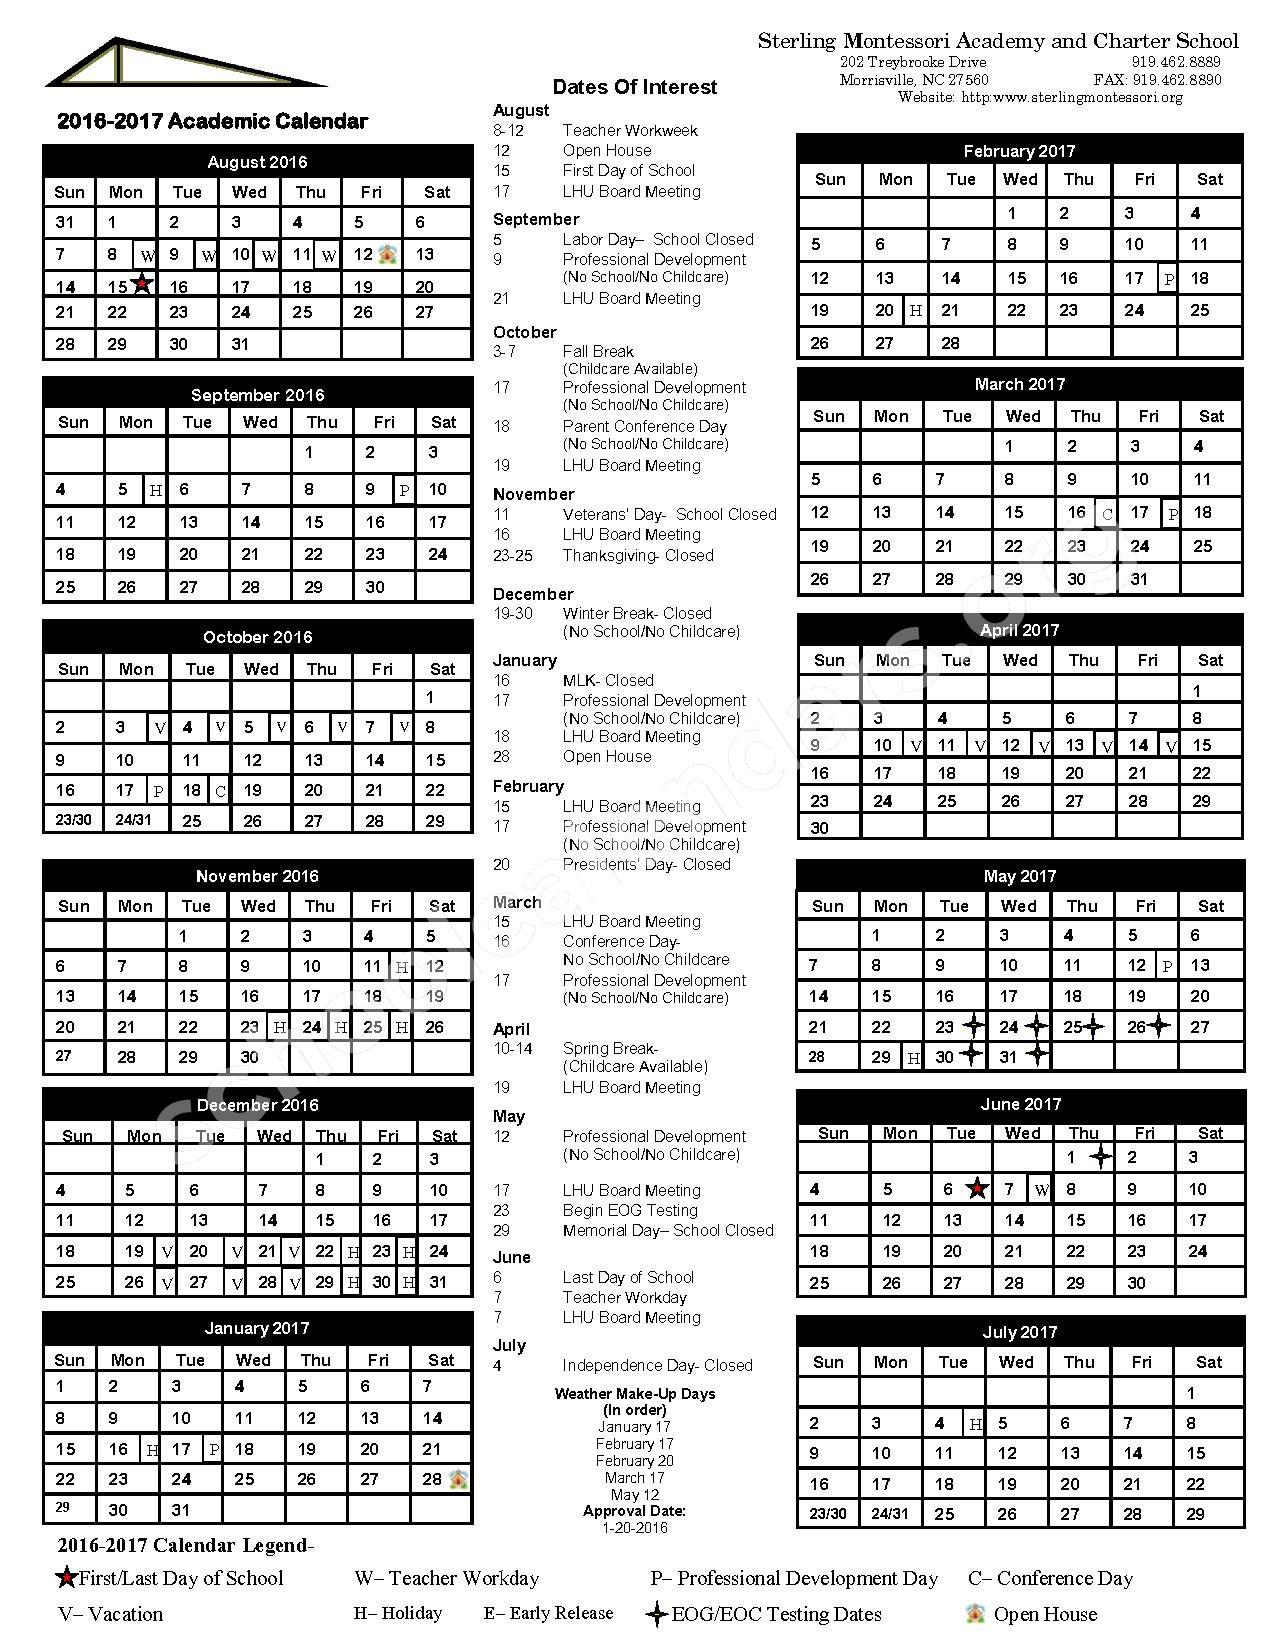 2016 - 2017 School Calendar – Sterling Montessori Academy – page 1